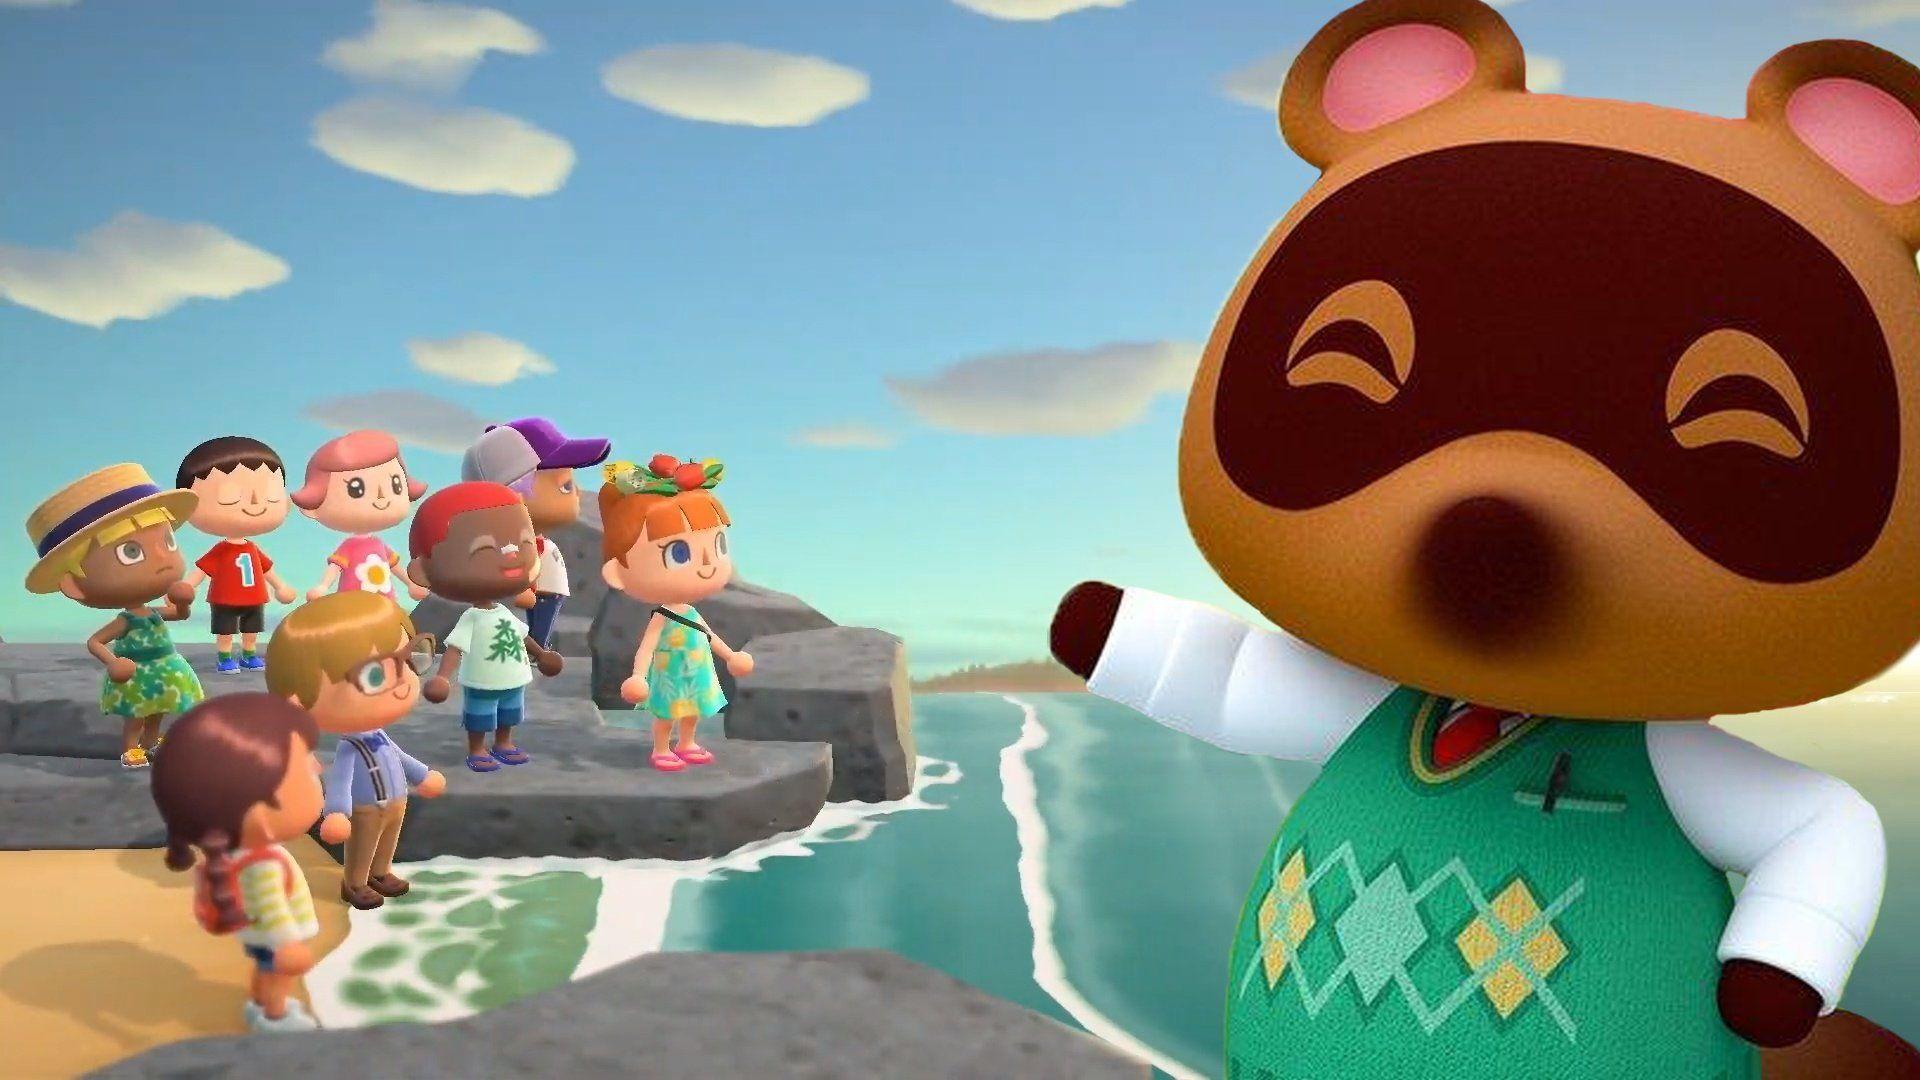 Animal Crossing: New Horizons Wallpapers - Wallpaper Cave